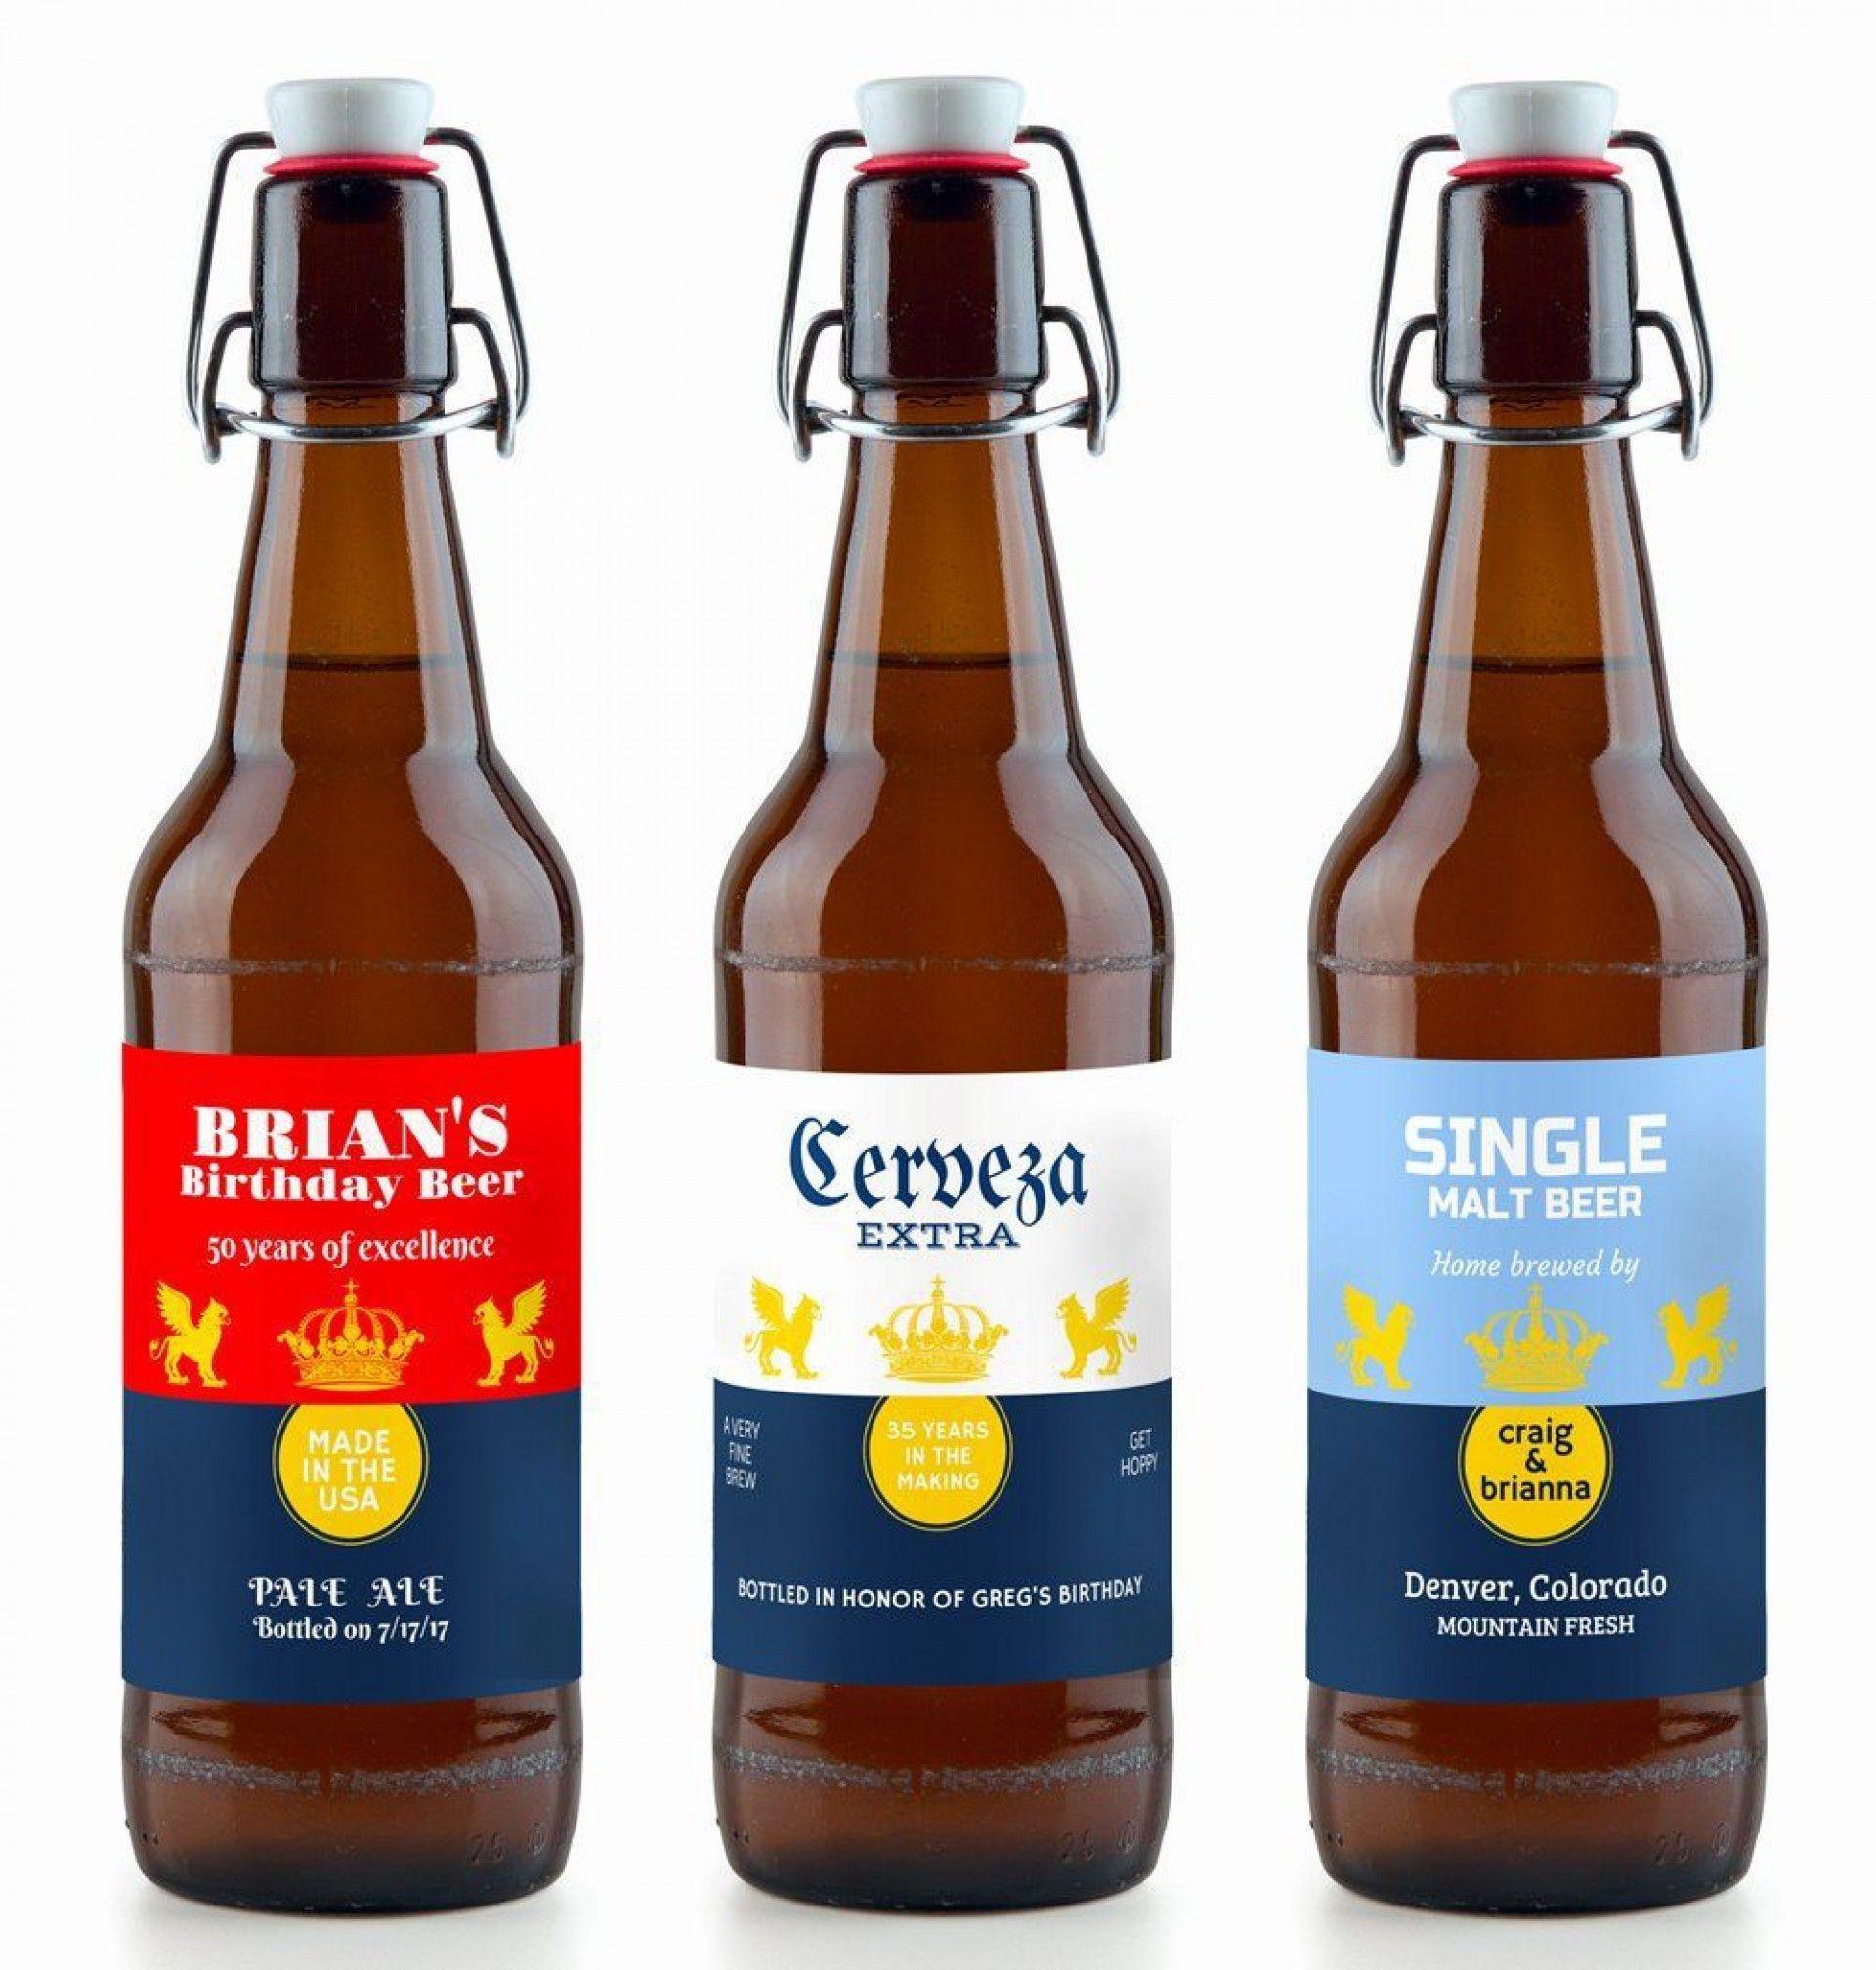 001 Best Beer Bottle Label Template Word Image  Free1920